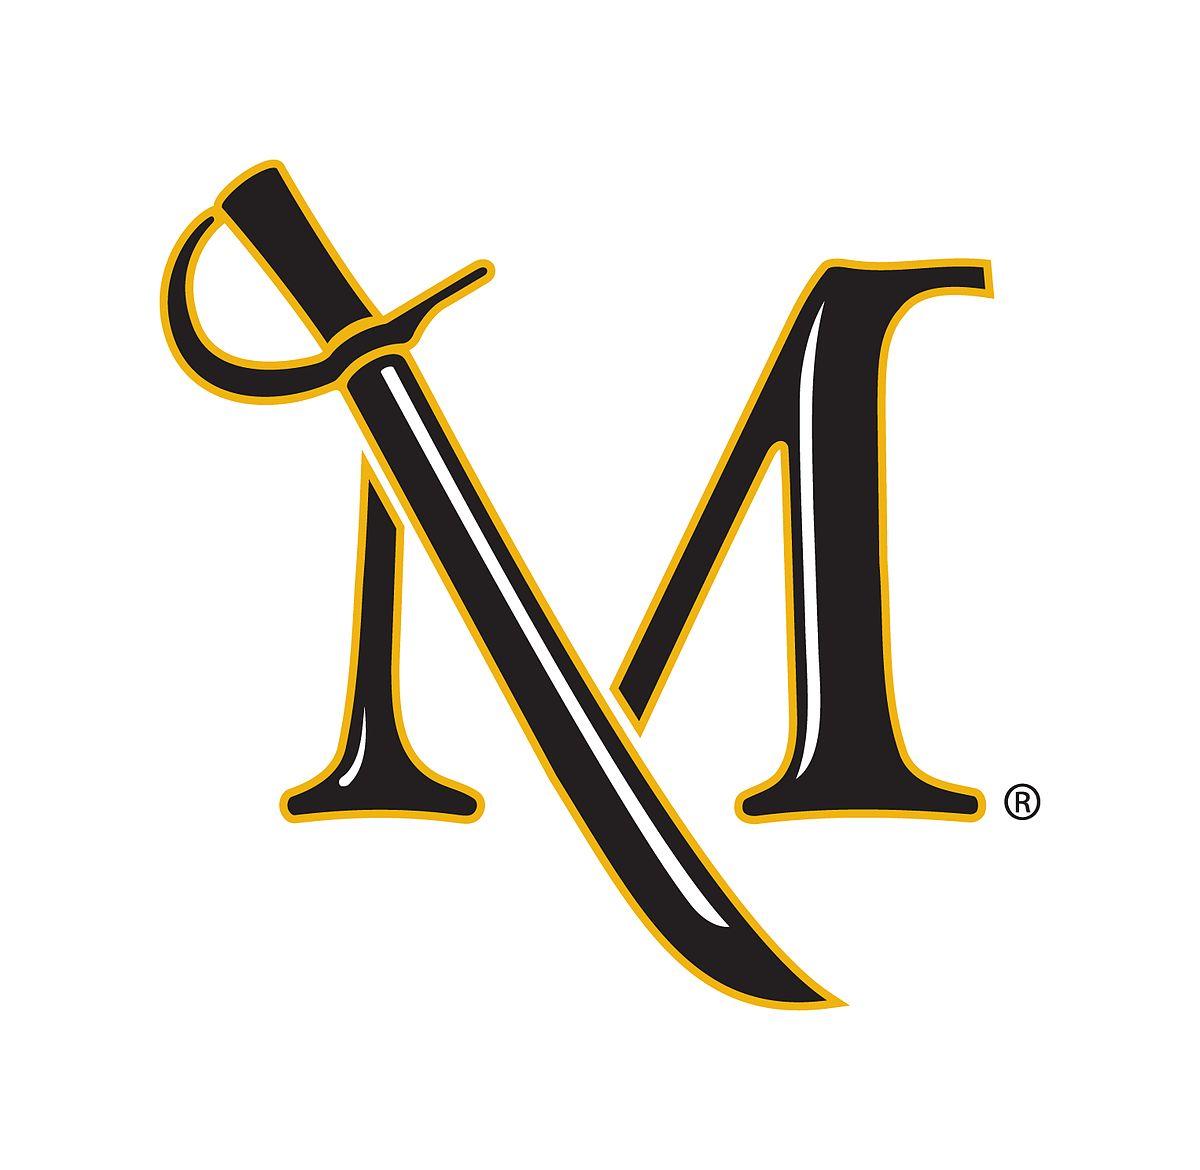 2017 Millersville Marauders Football Team Wikipedia